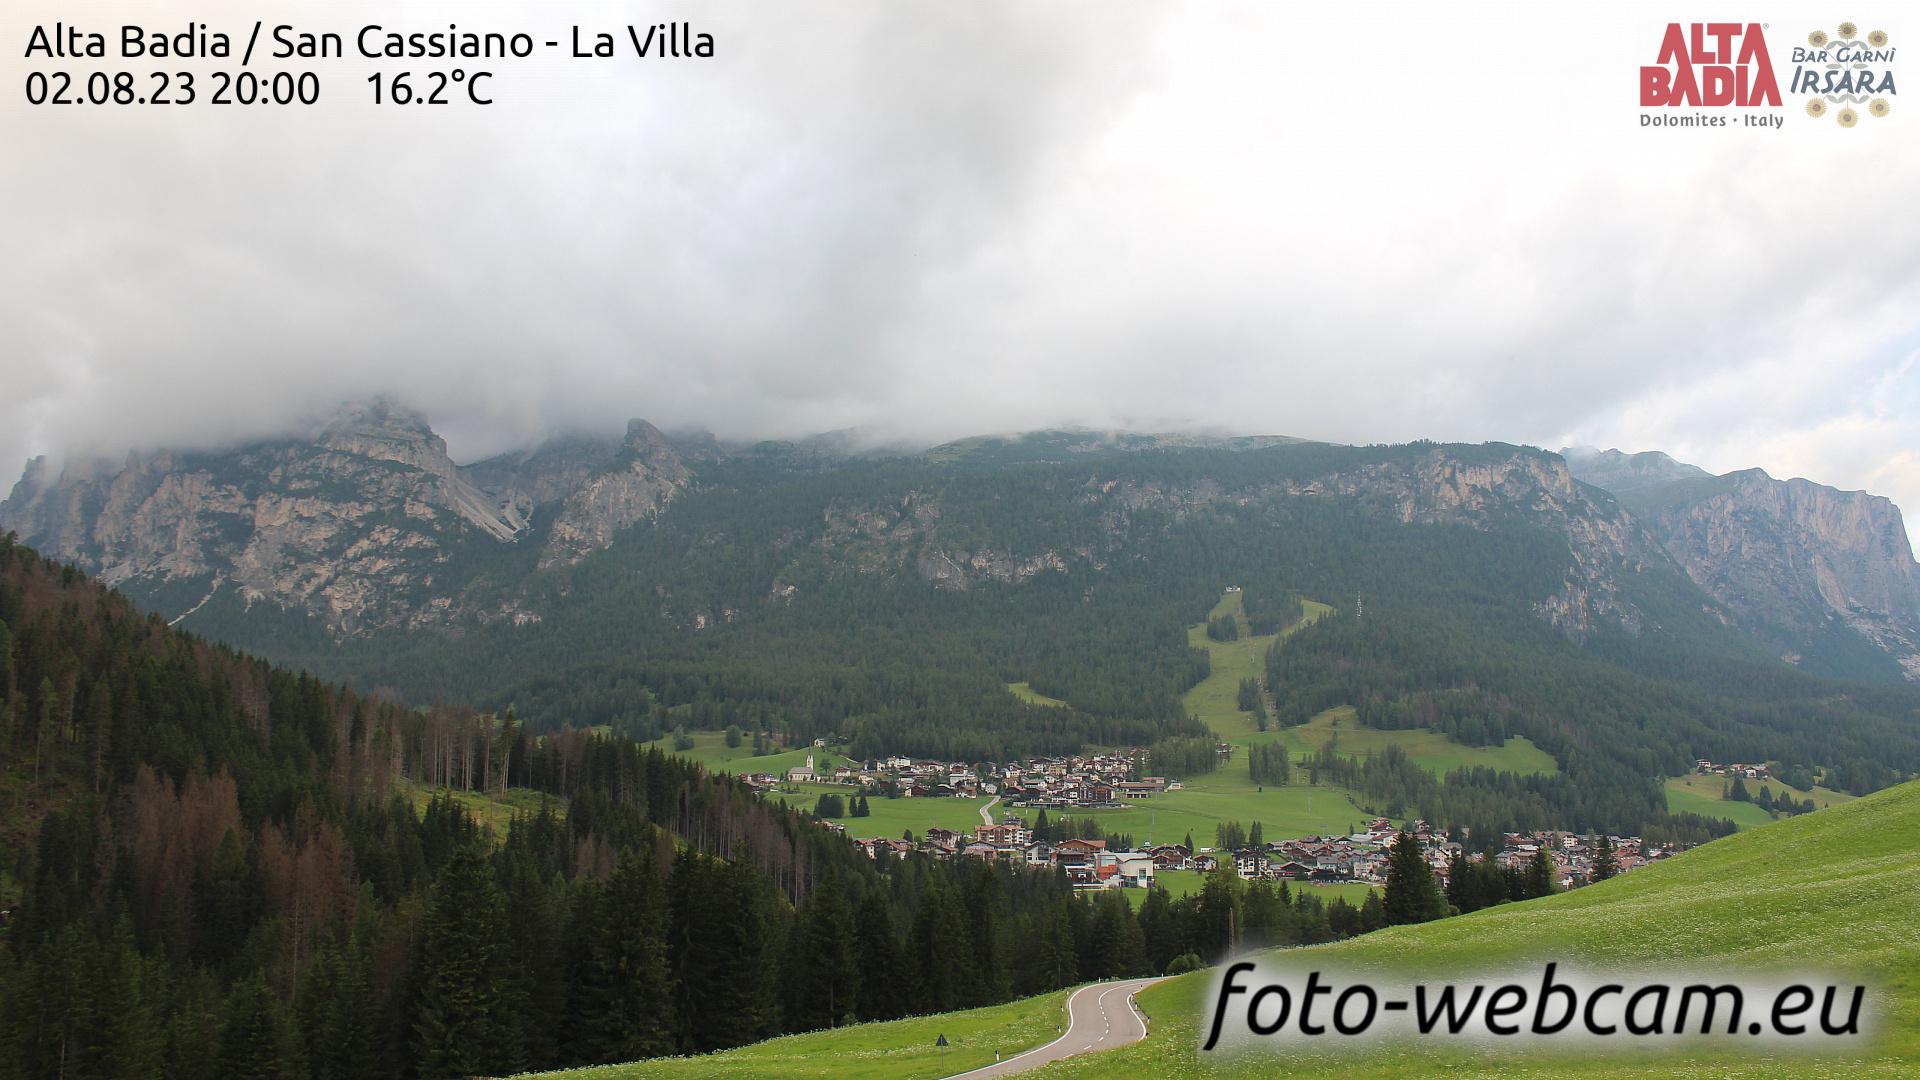 San Cassiano Sun. 20:04